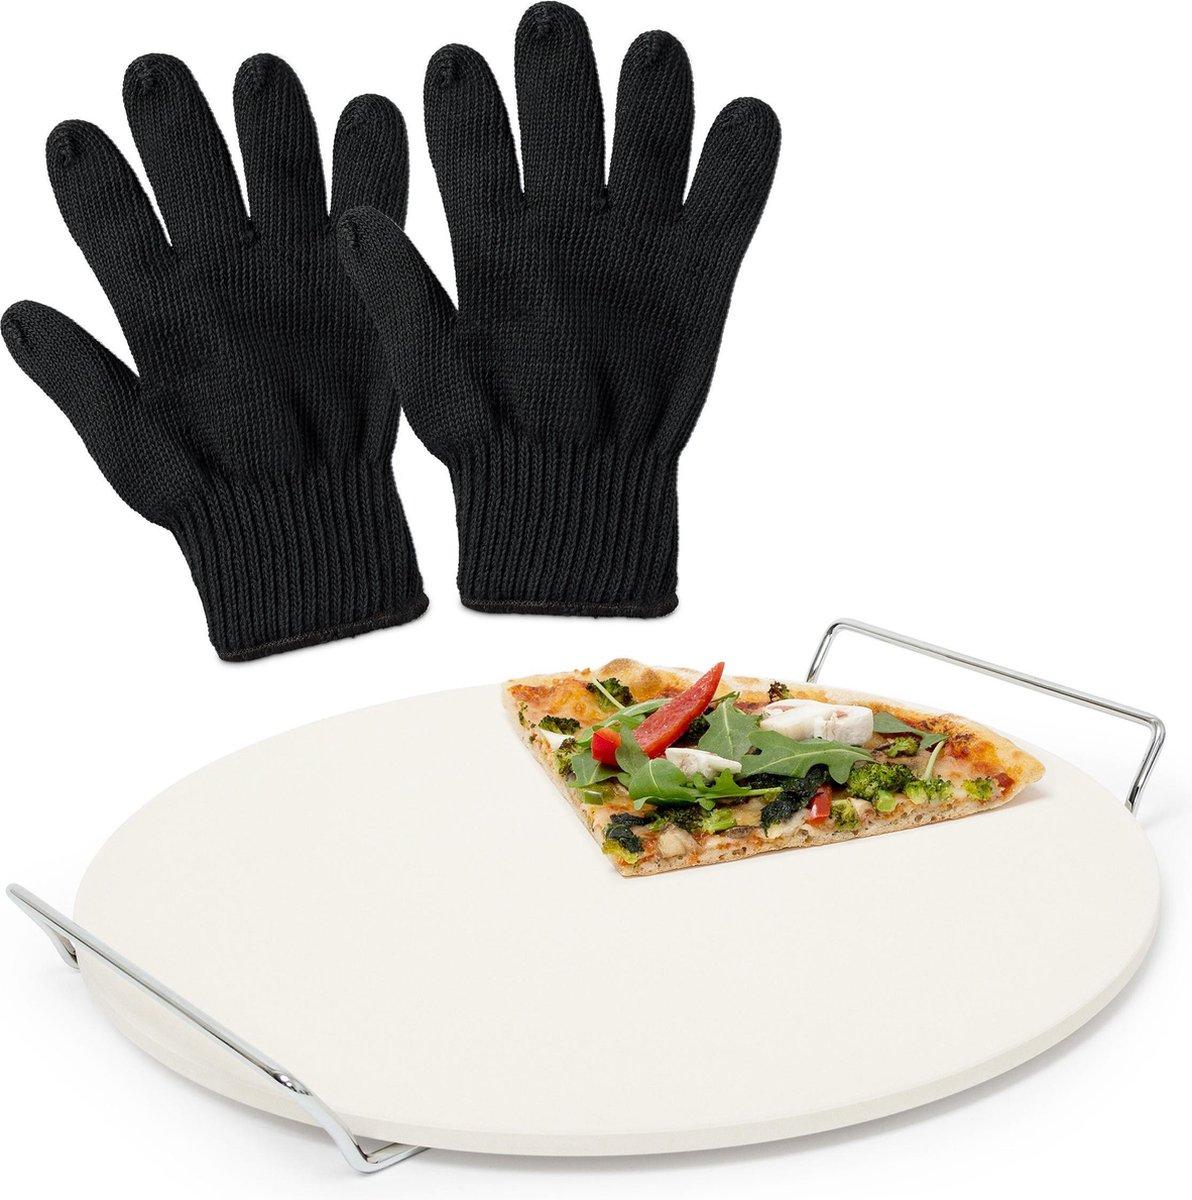 relaxdays 3er pizza set - pizzasteen oven - pizza steen bbq - ovenhandschoenen - zwart